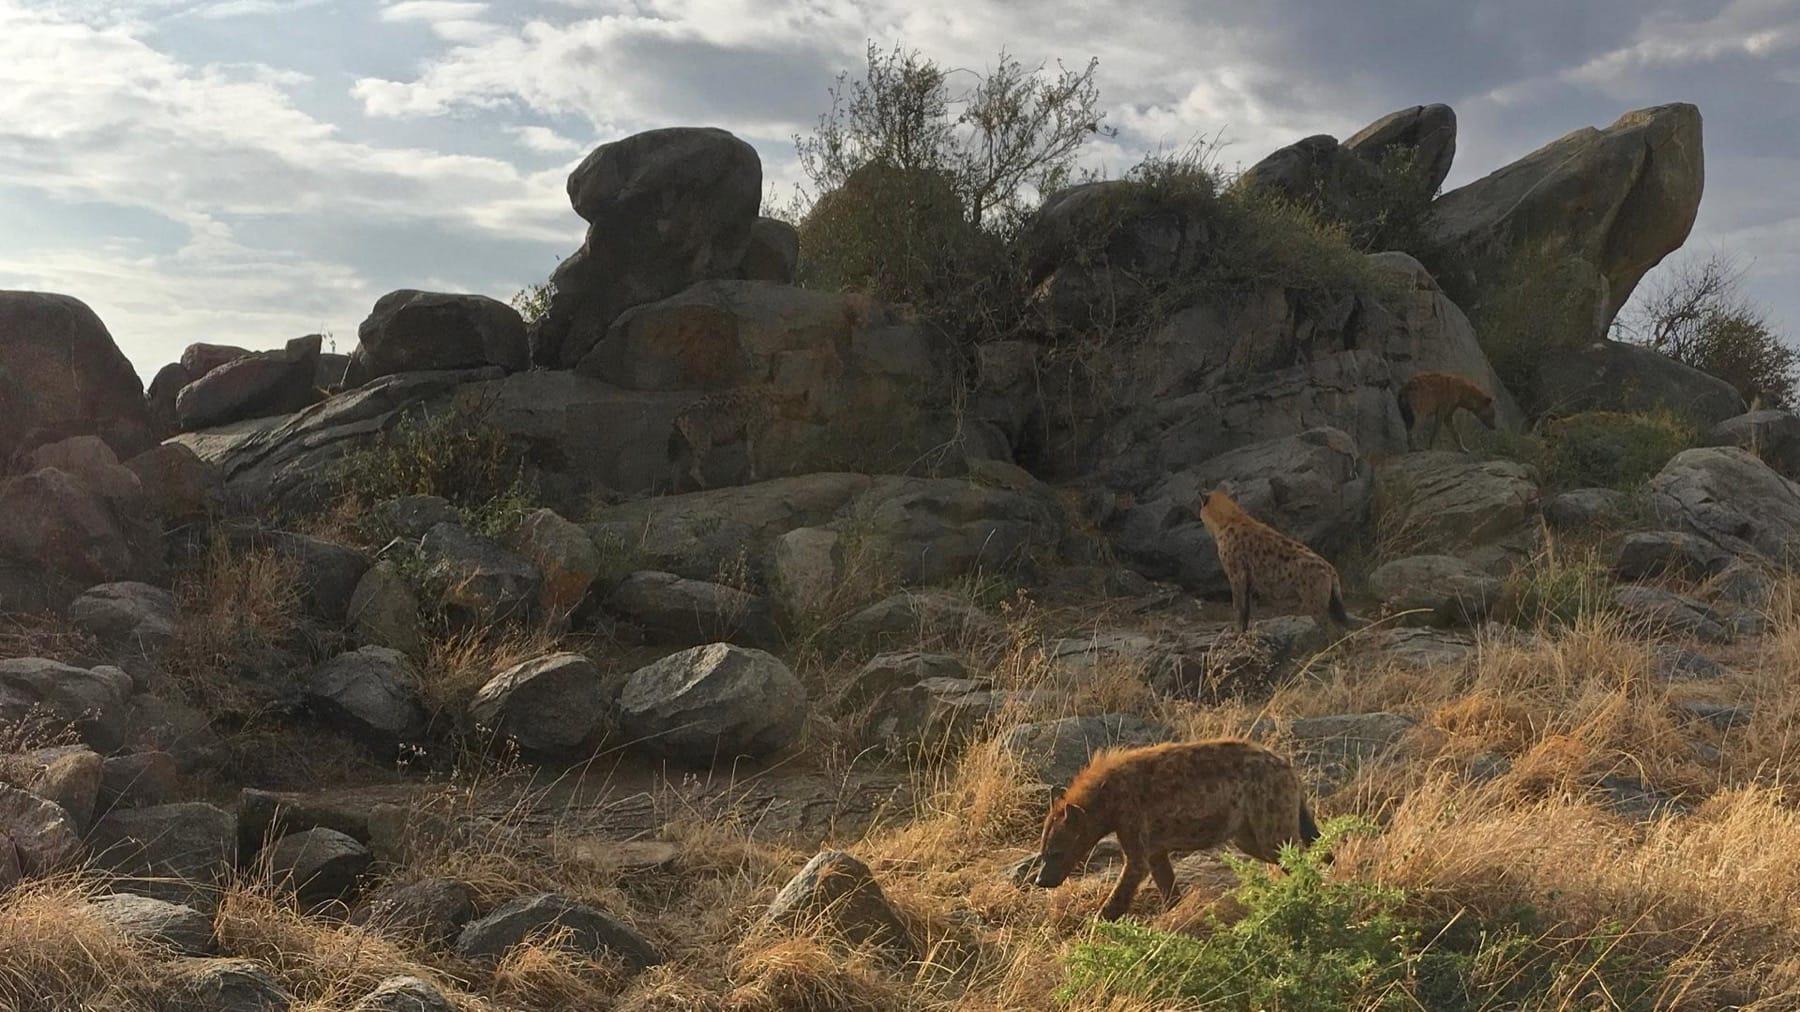 hyena ngorongoro crater wildlife tanzania safari